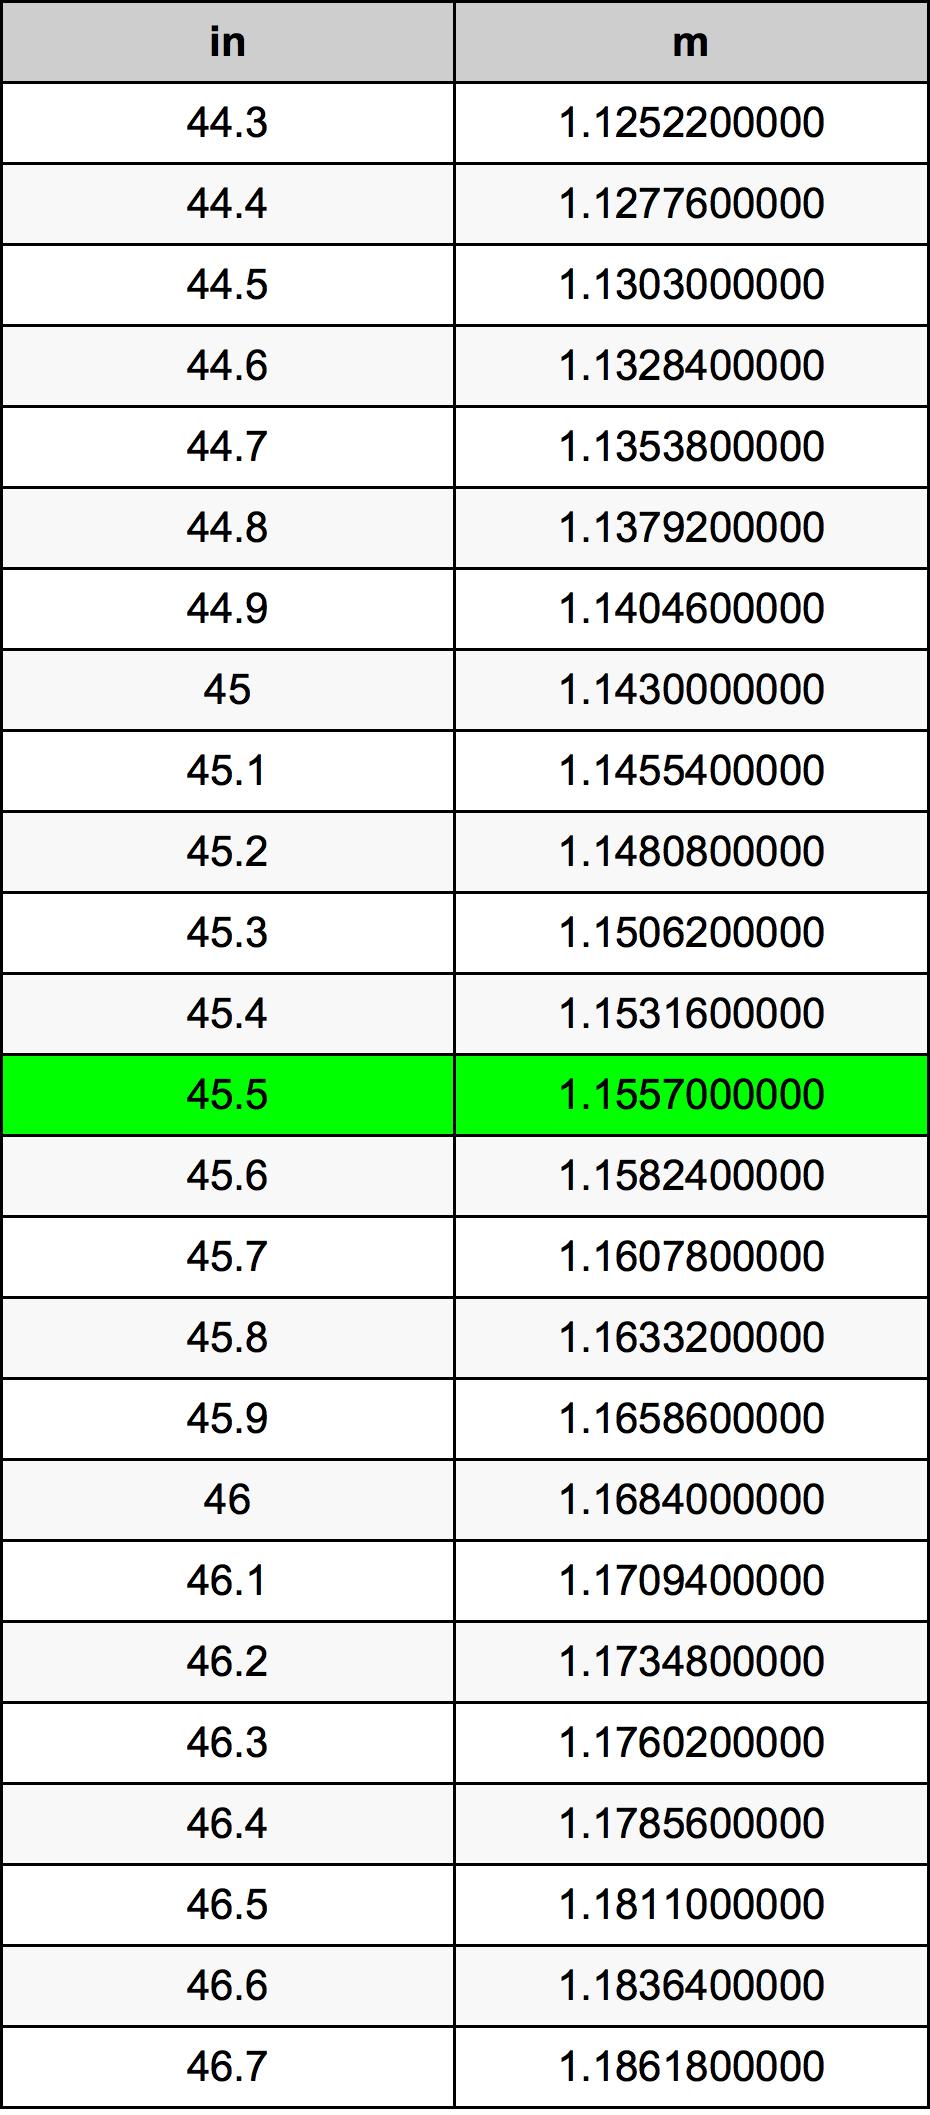 45.5 дюйм Таблица преобразования